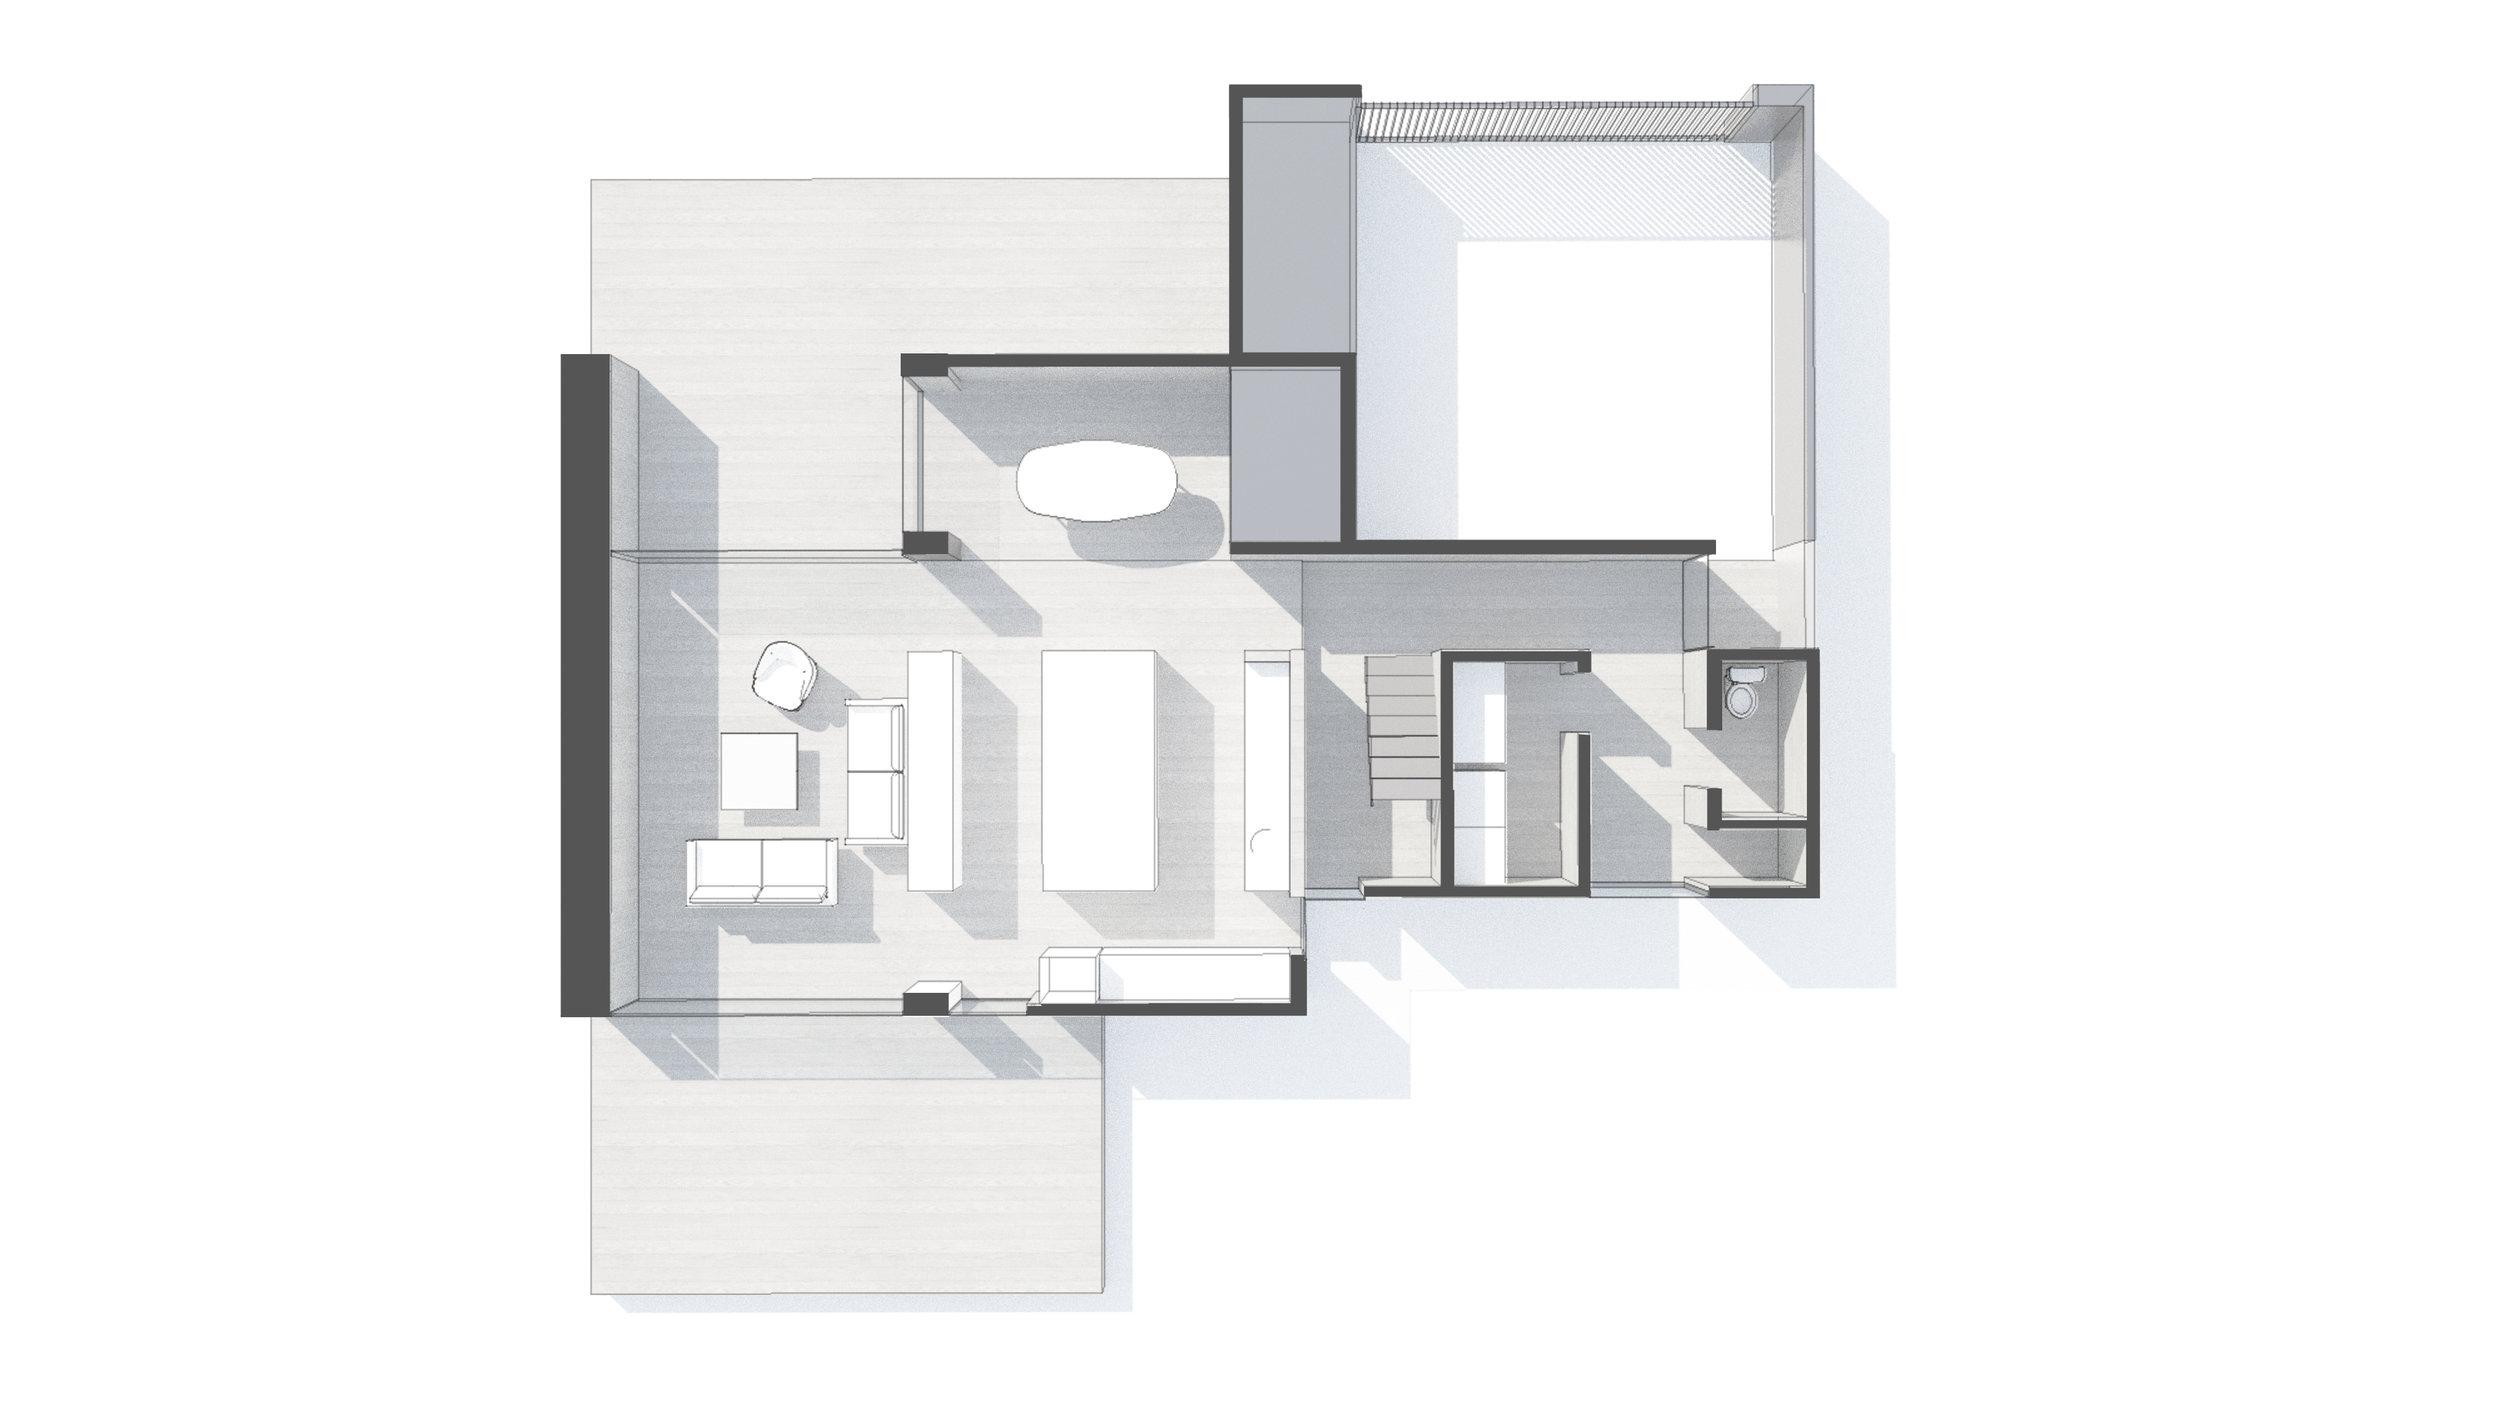 Plan_01.jpg